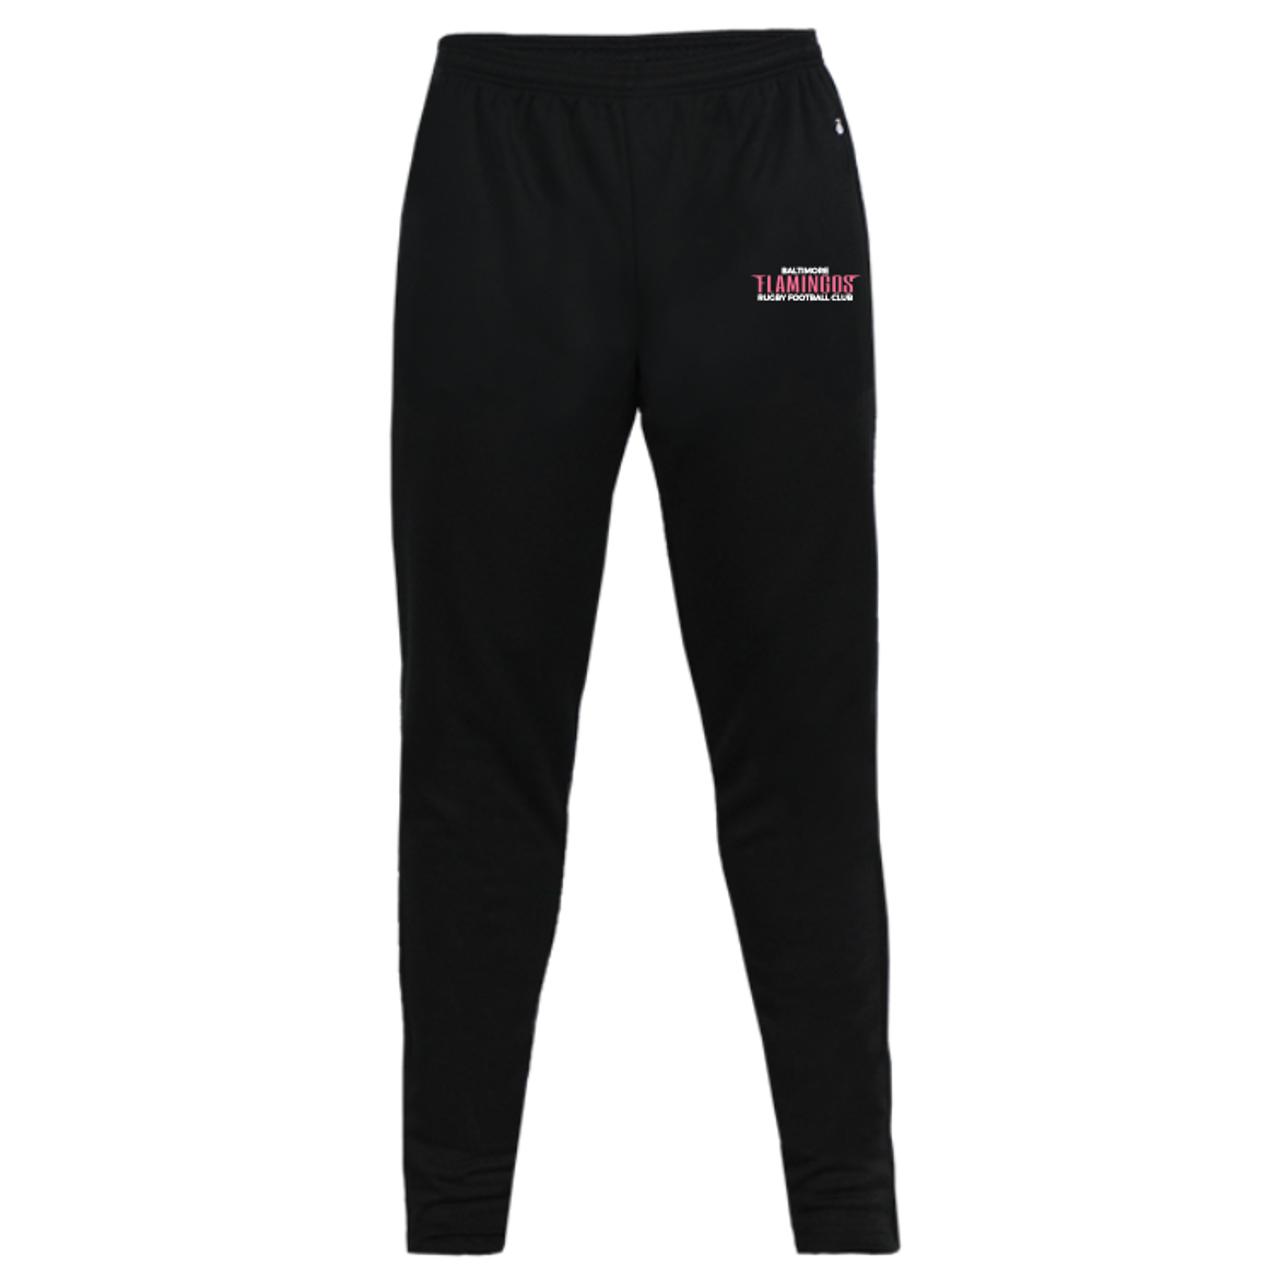 Baltimore Flamingos Trainer Pants